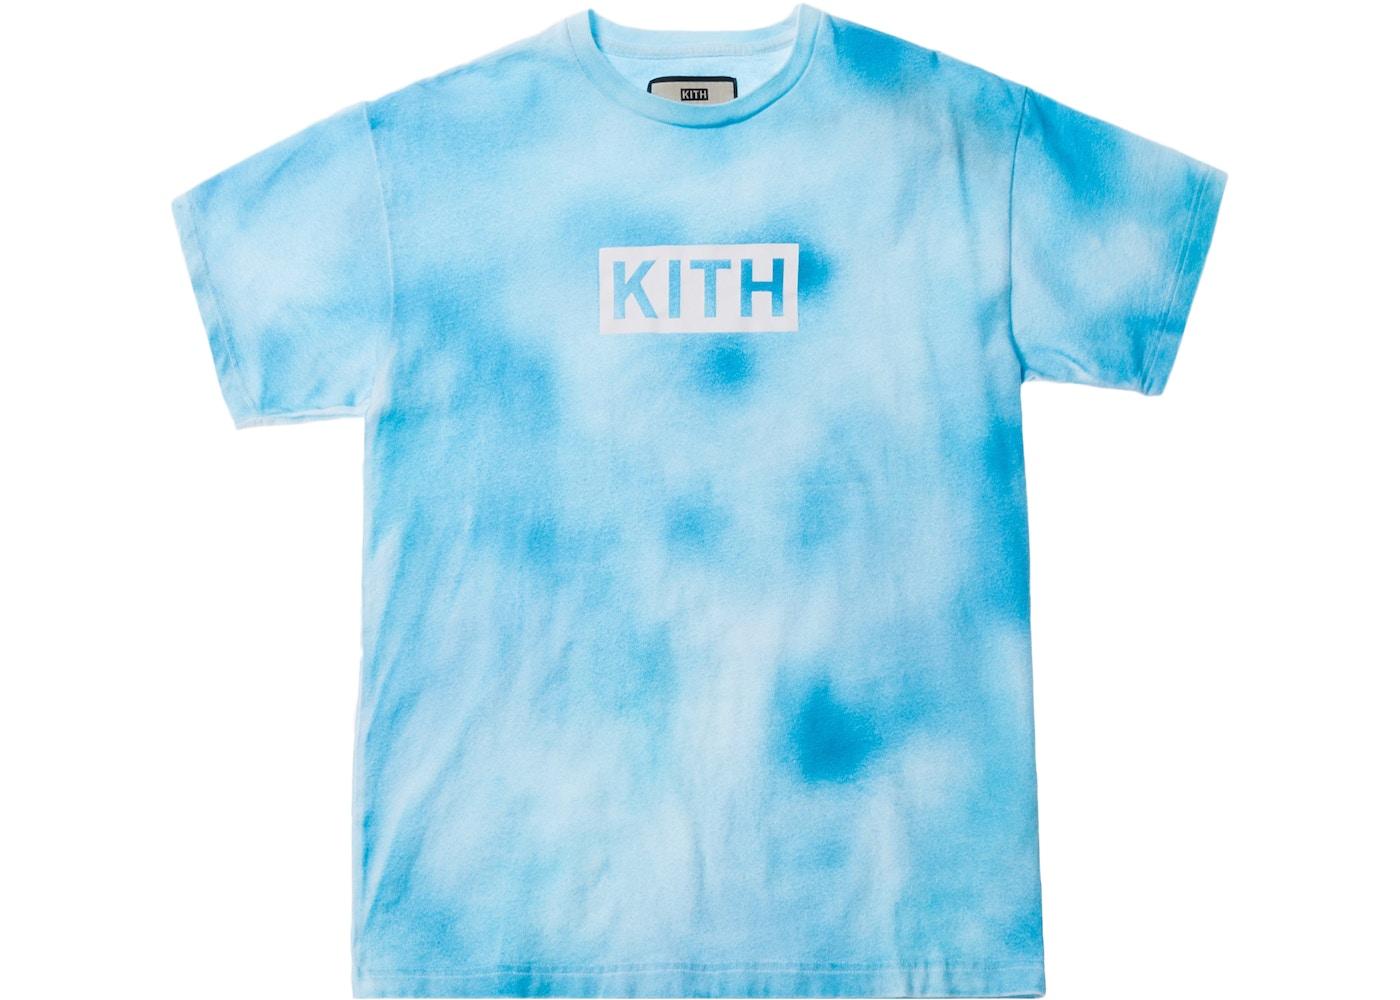 58c9f66d76c Sell. or Ask. Size  XL. View All Bids. Kith Tie Dye Box Logo Tee Blue